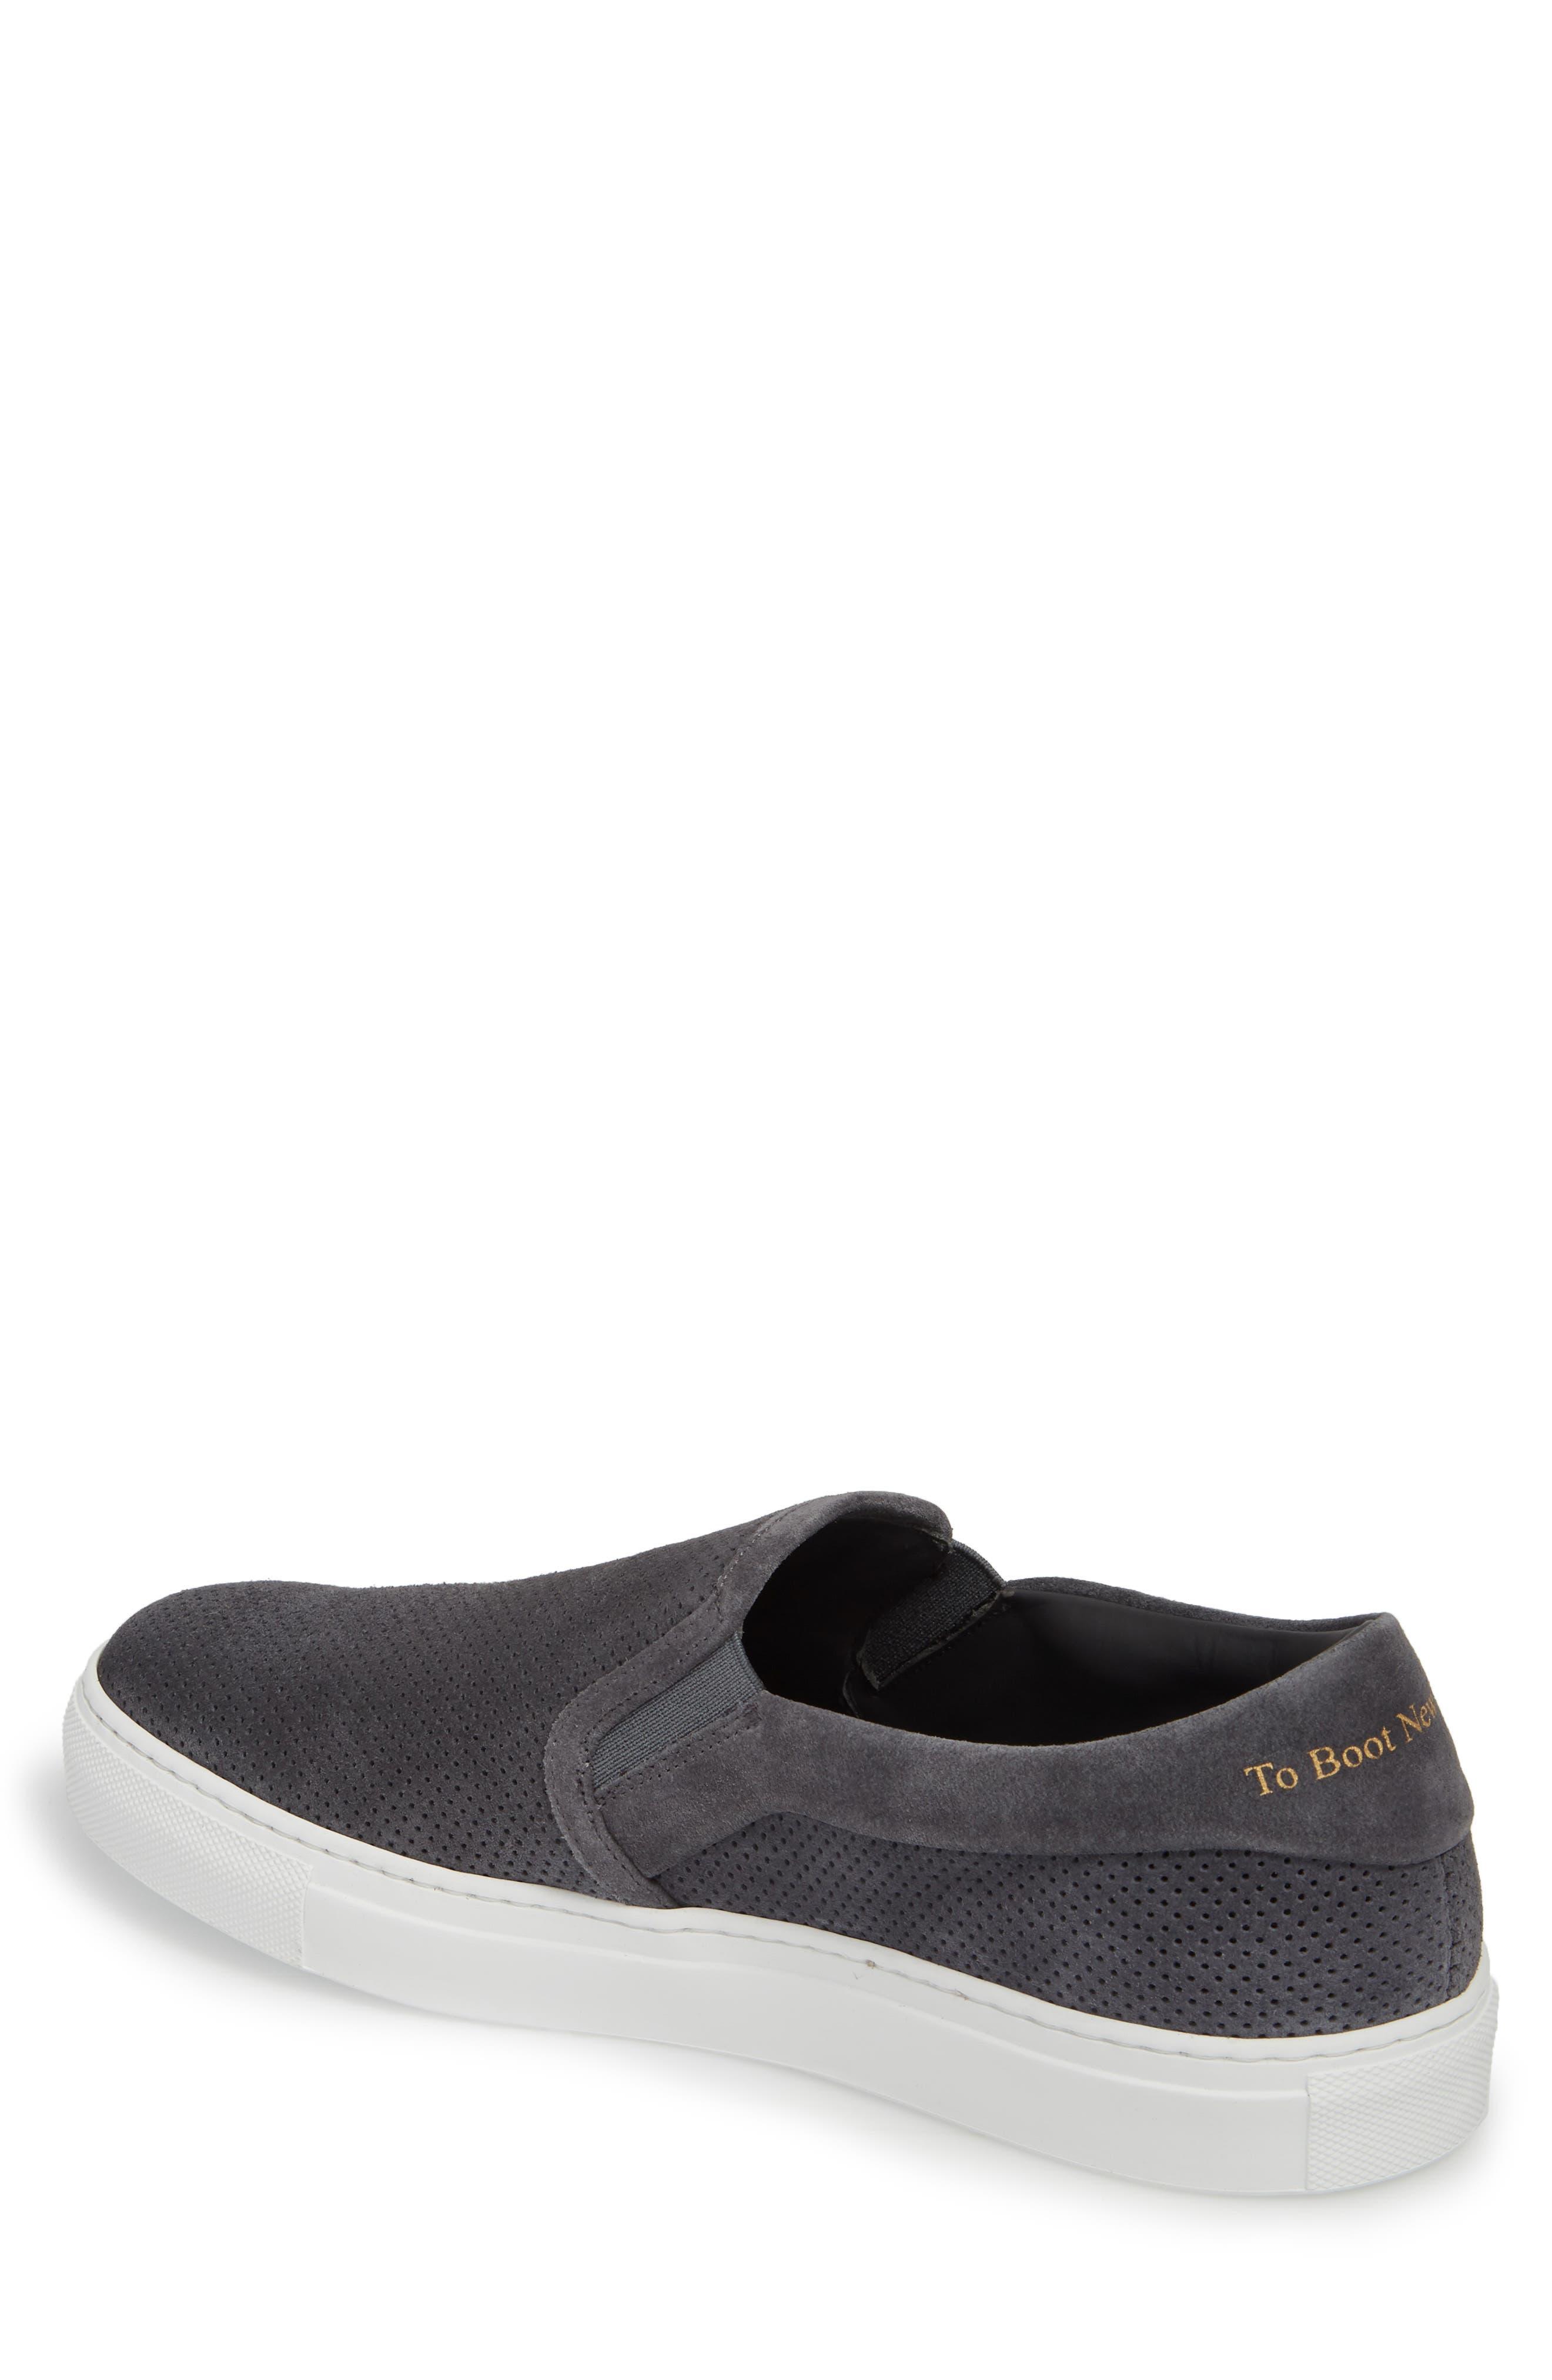 Buelton Perforated Slip-On Sneaker,                             Alternate thumbnail 2, color,                             Avion/ Tan Suede